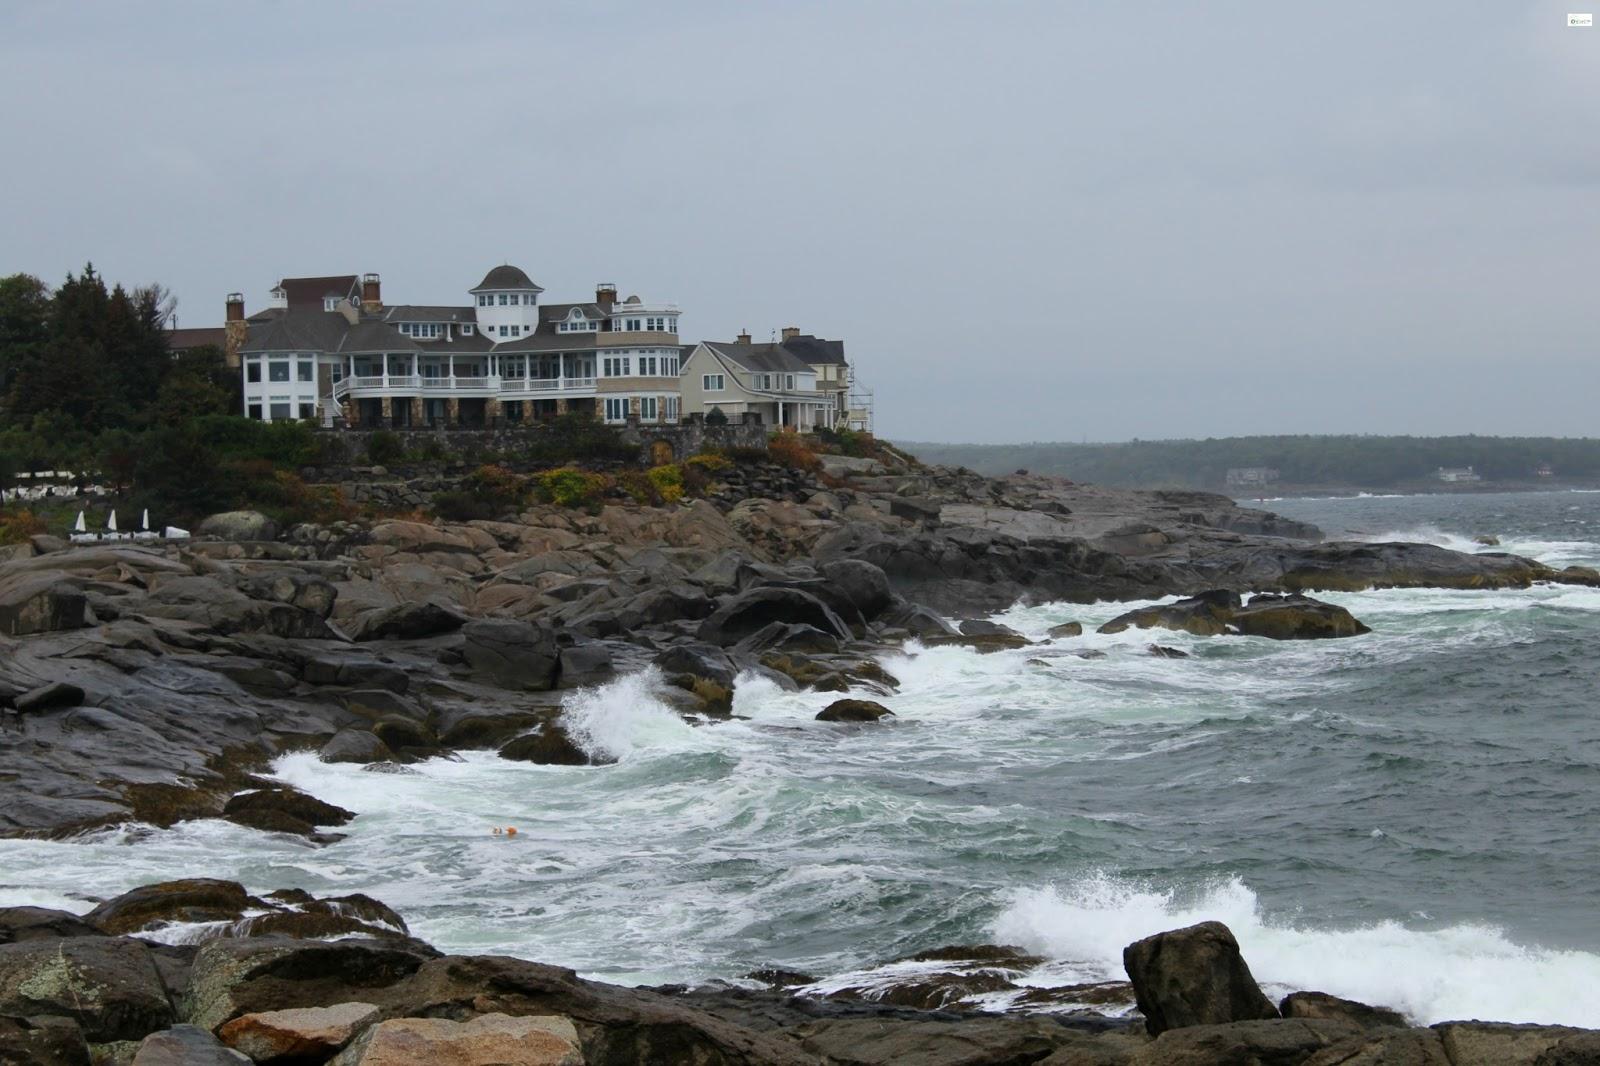 Caravan Sonnet A Drive Through Beautiful Maine And A